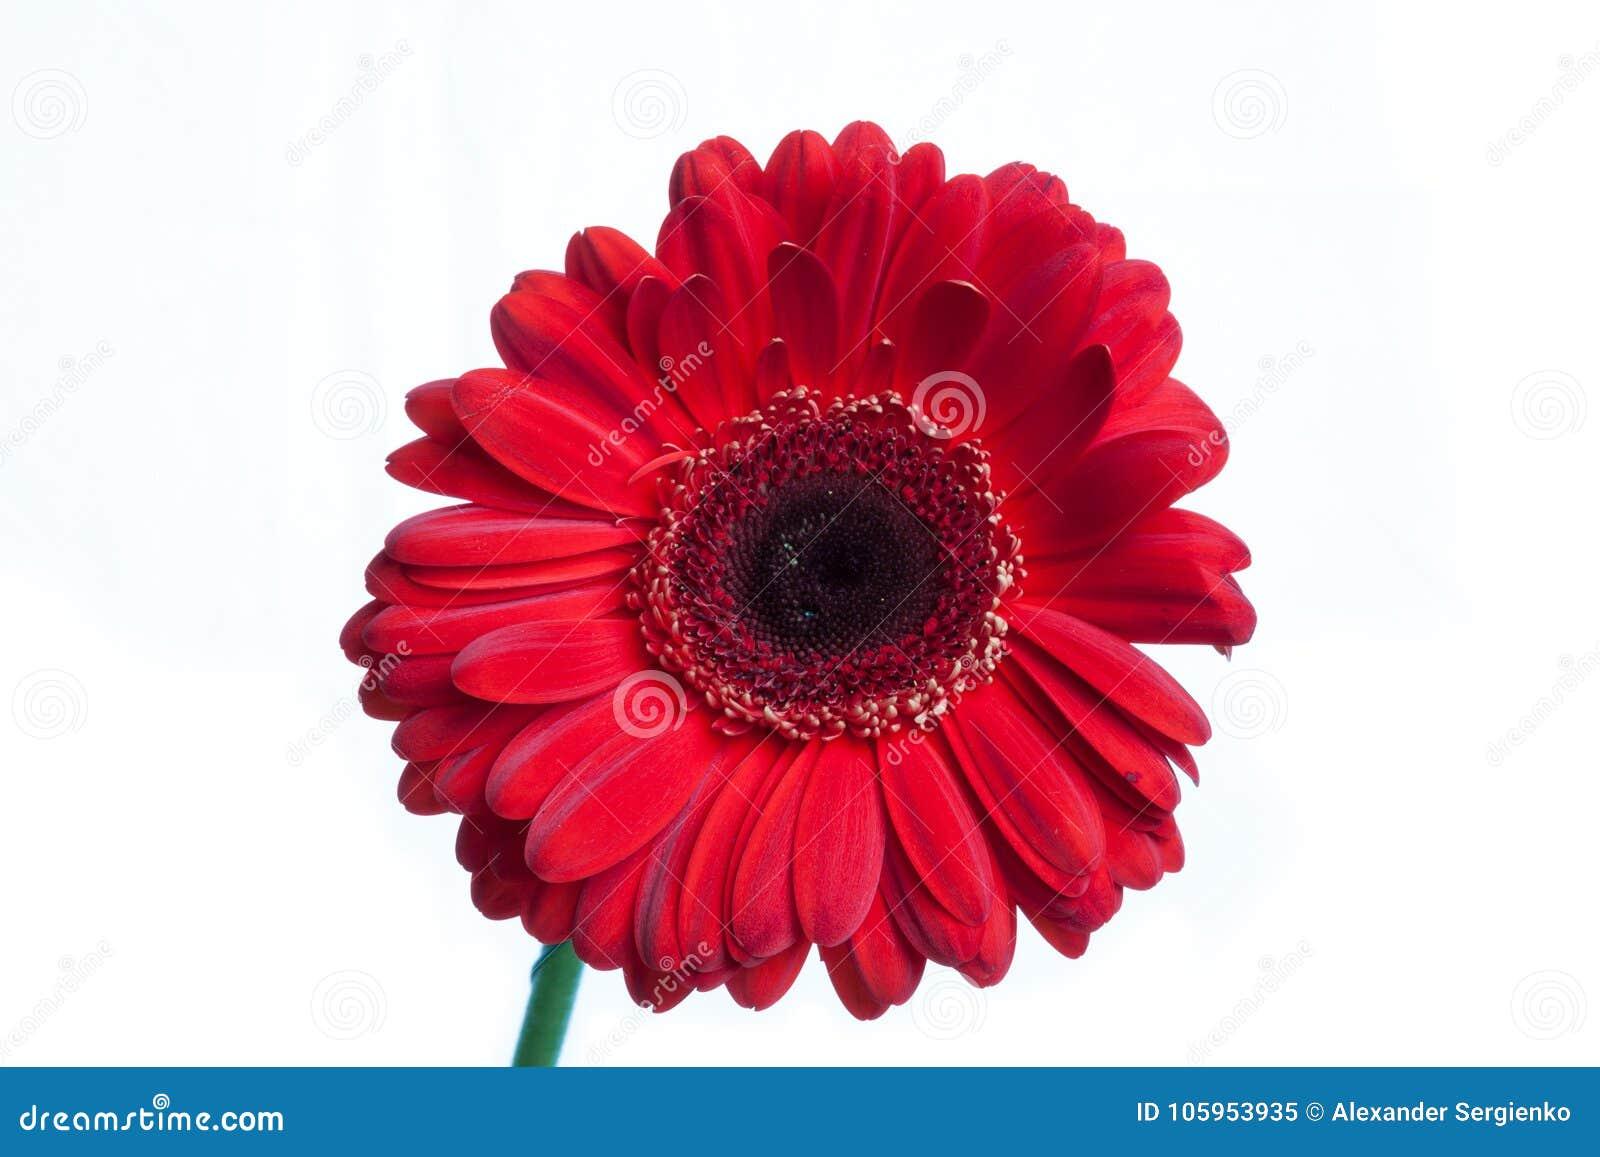 Red single gerbera isolated on white stock image image of single download red single gerbera isolated on white stock image image of single isolated izmirmasajfo